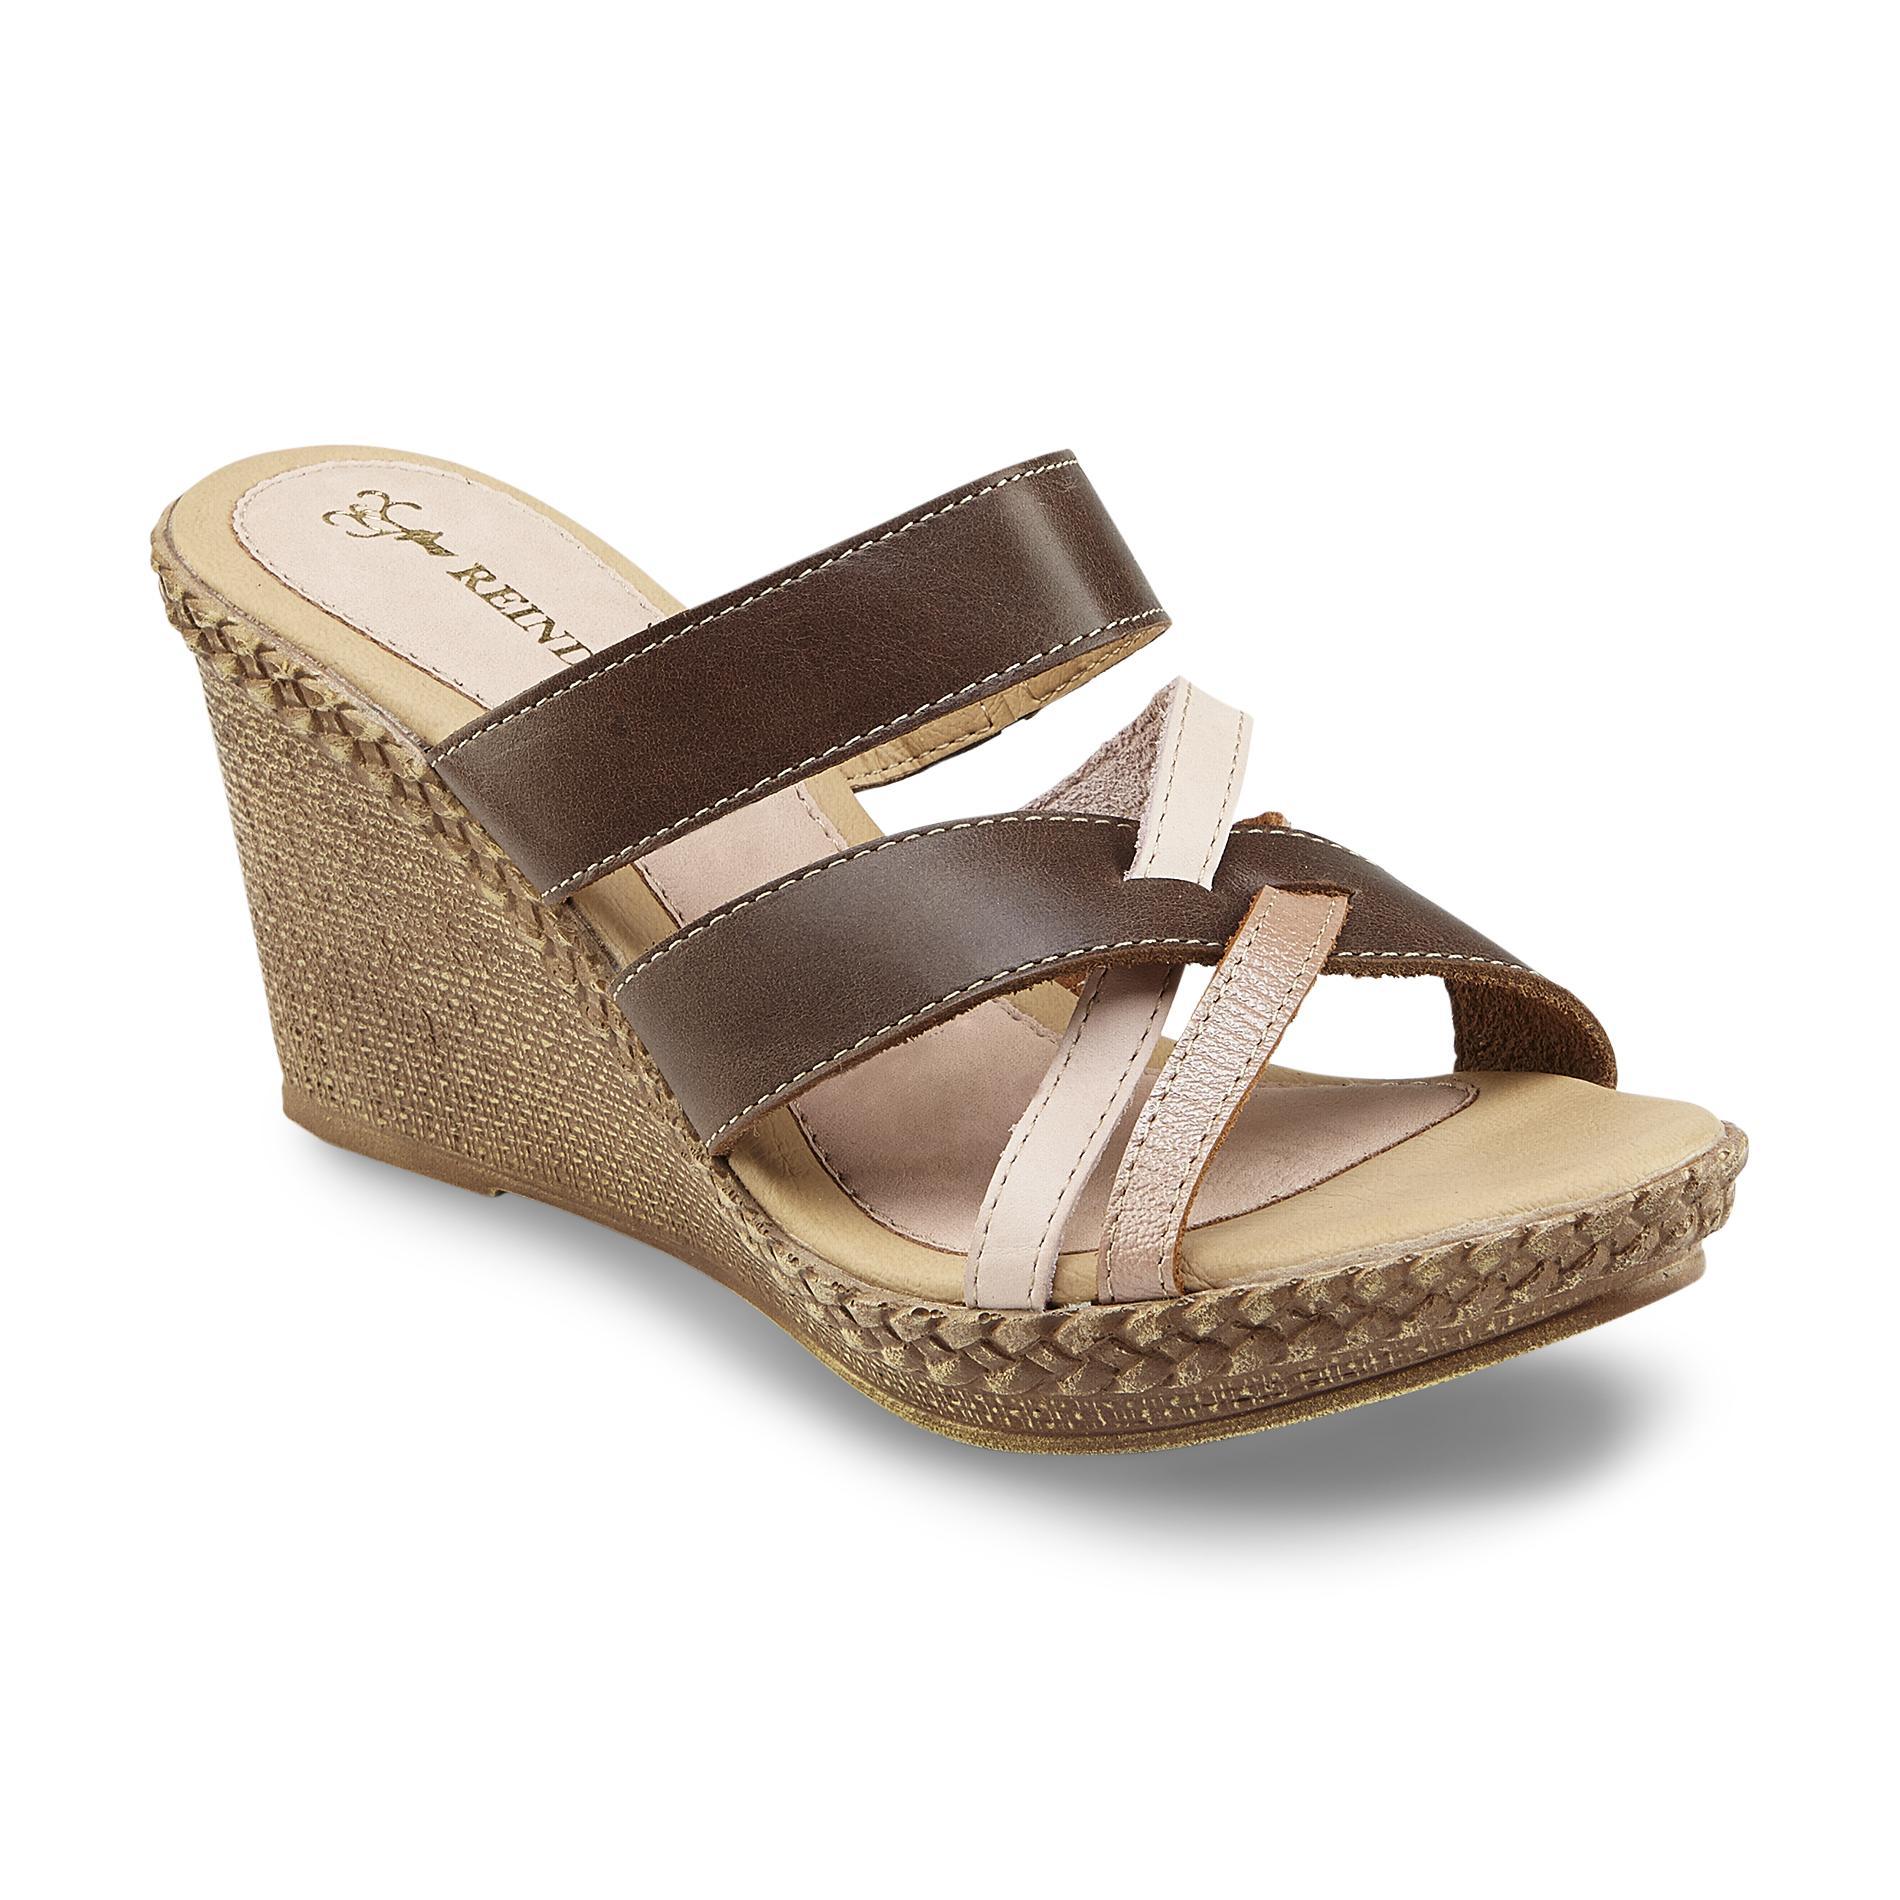 Reindeer Women' Manuela Brown Pink Leather Wedge Sandal - Shoes Sandals